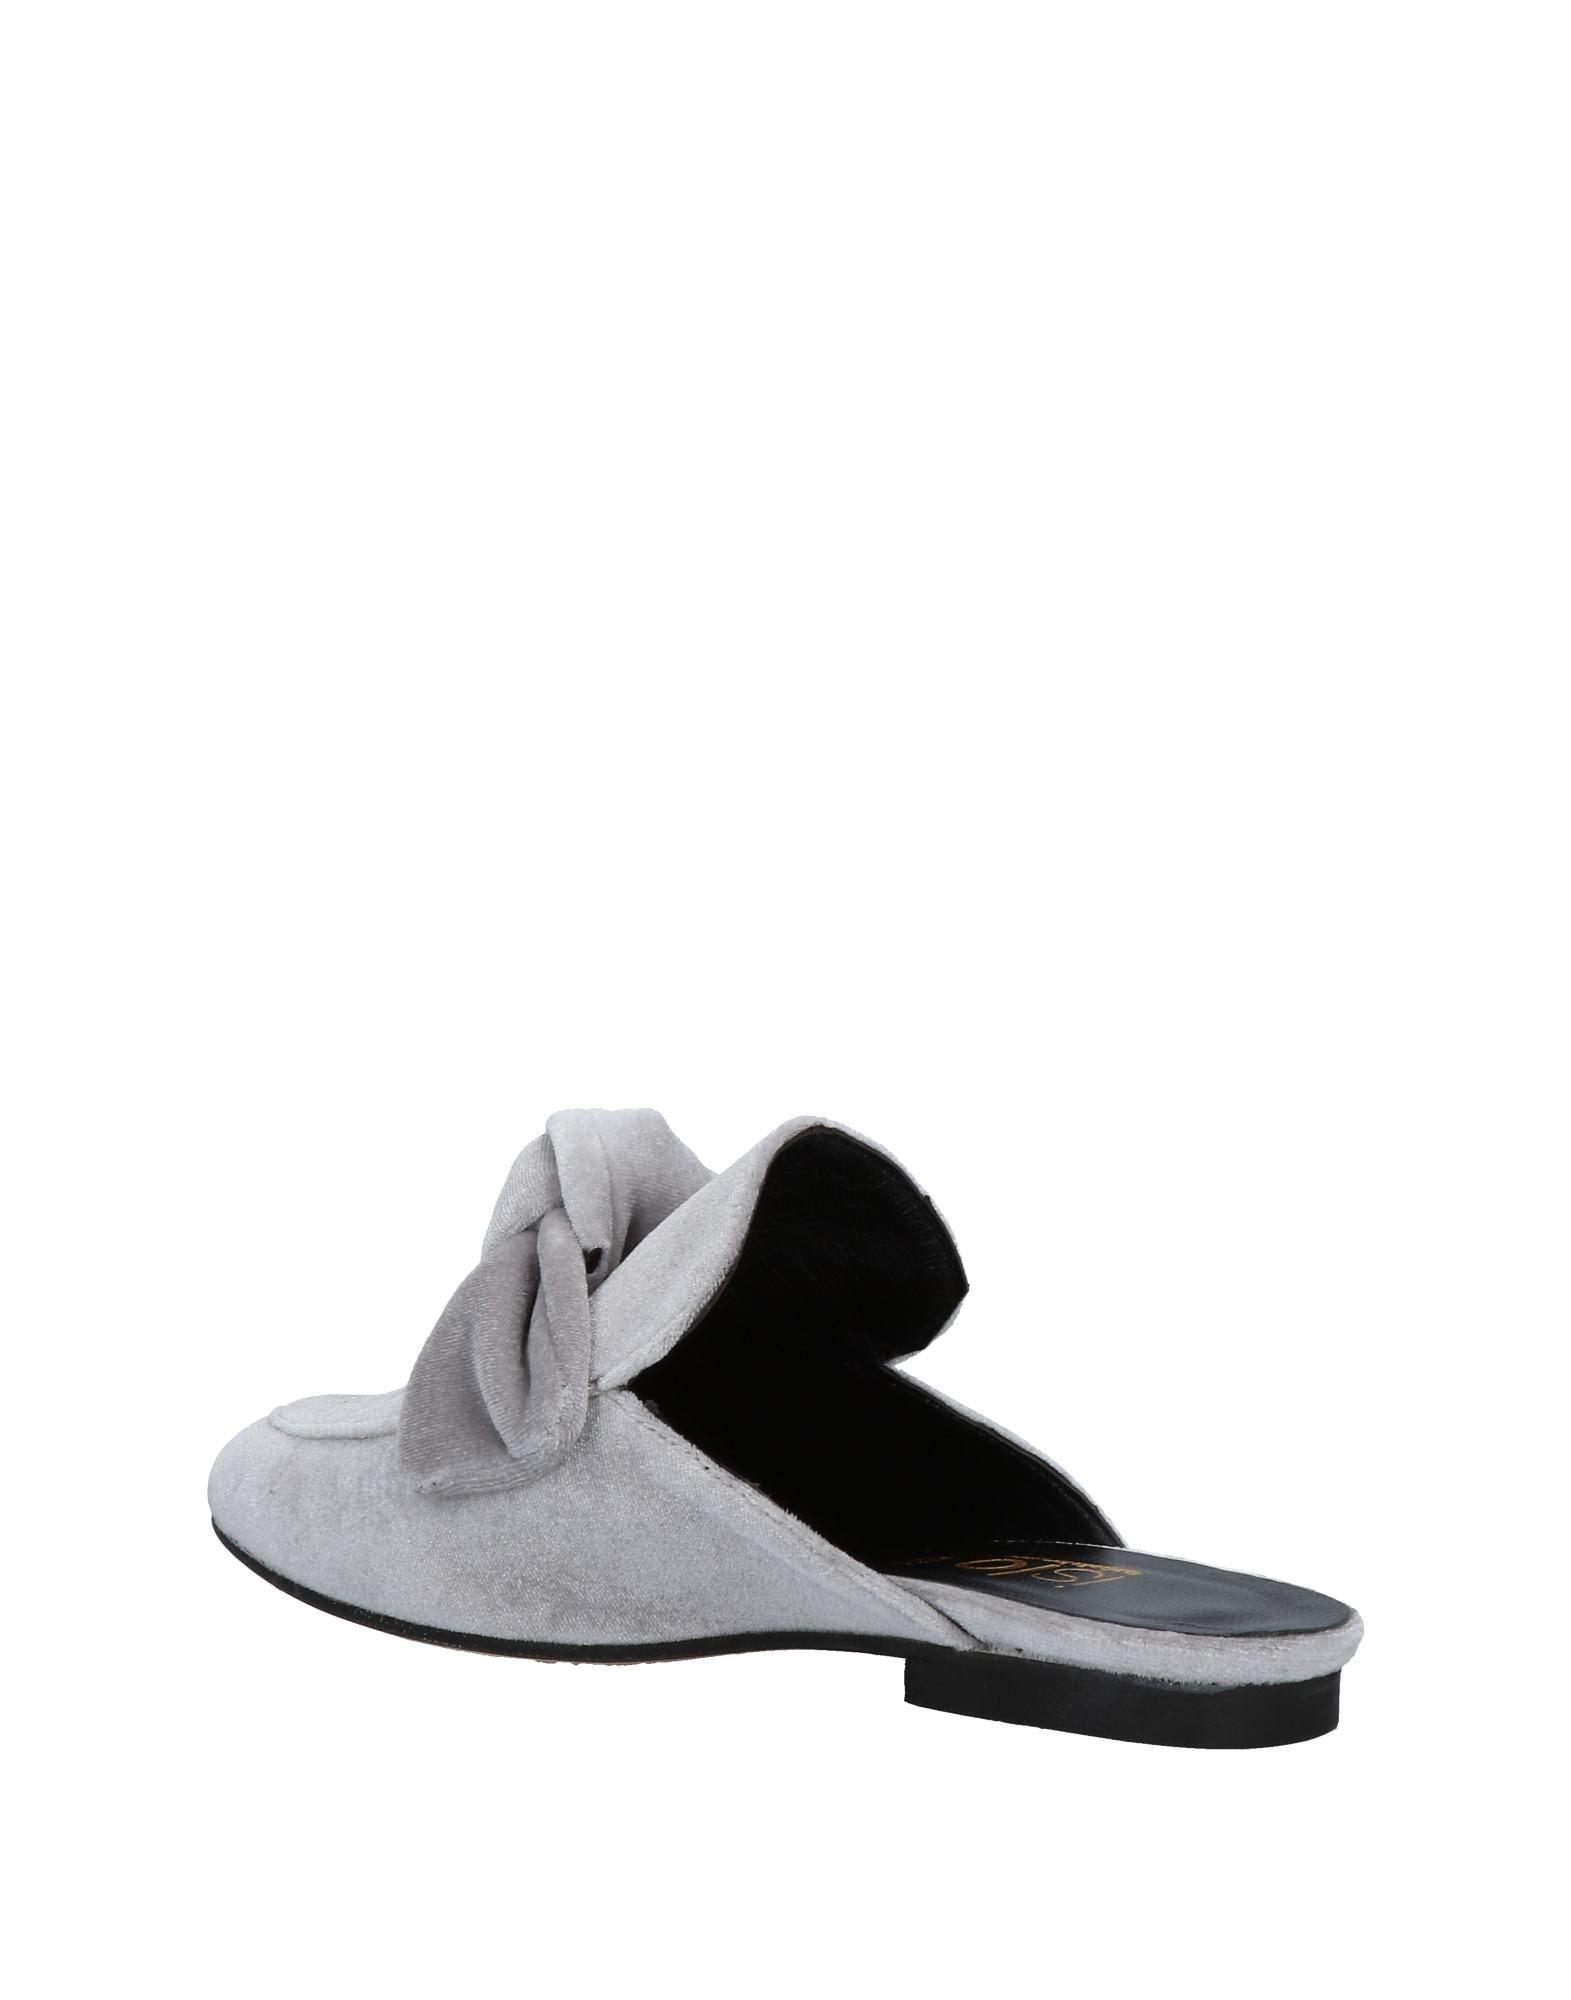 Islo Isabella Lorusso Pantoletten Damen  11485955OR 11485955OR  Neue Schuhe 146c8a